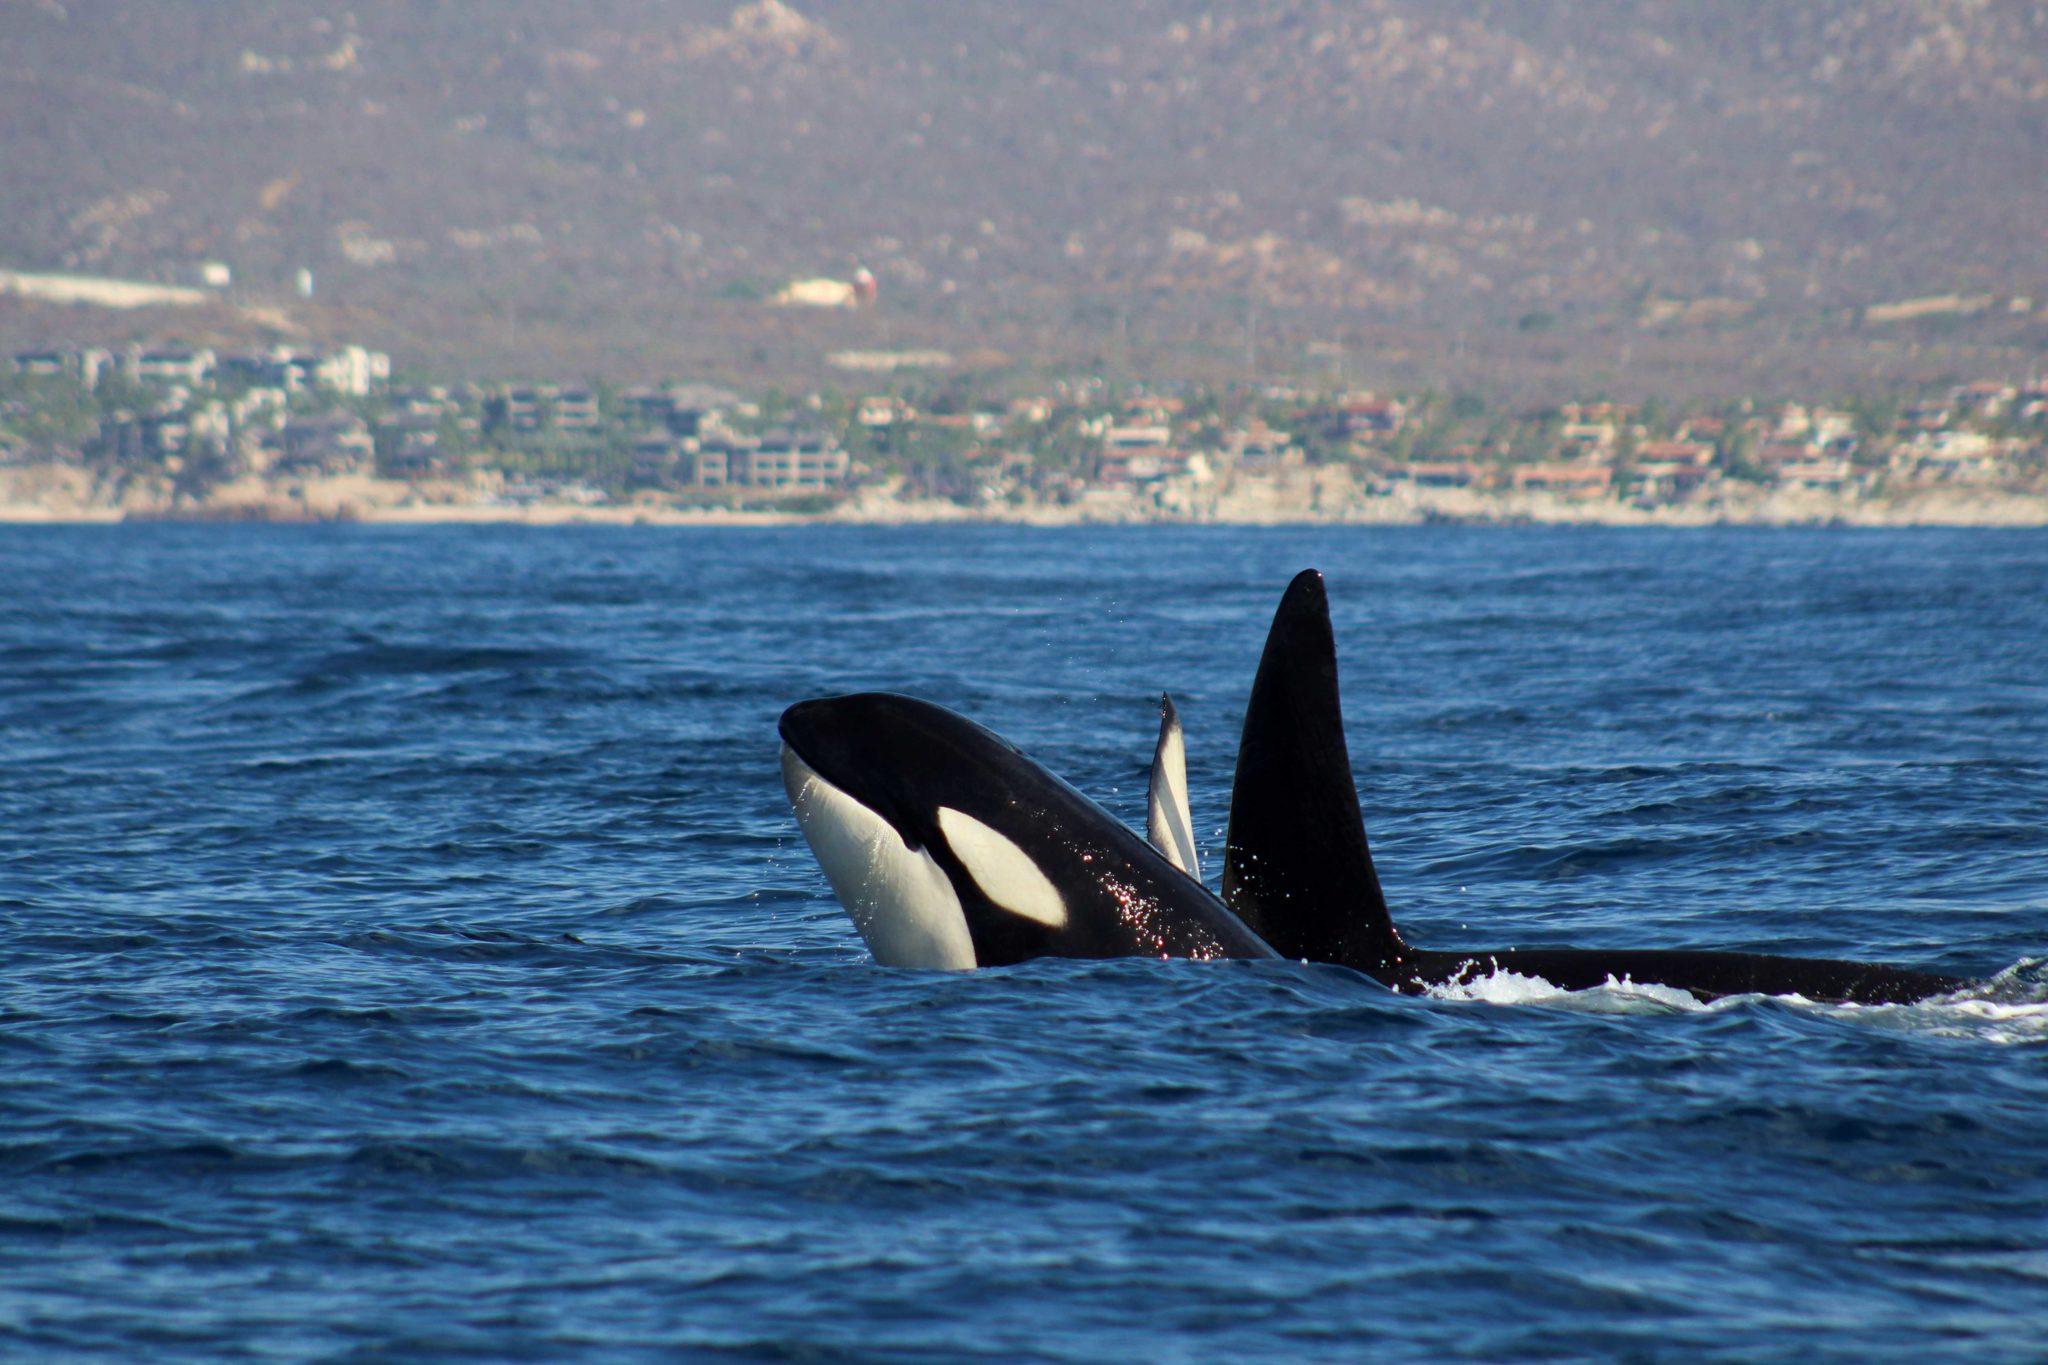 The social life of Orcas